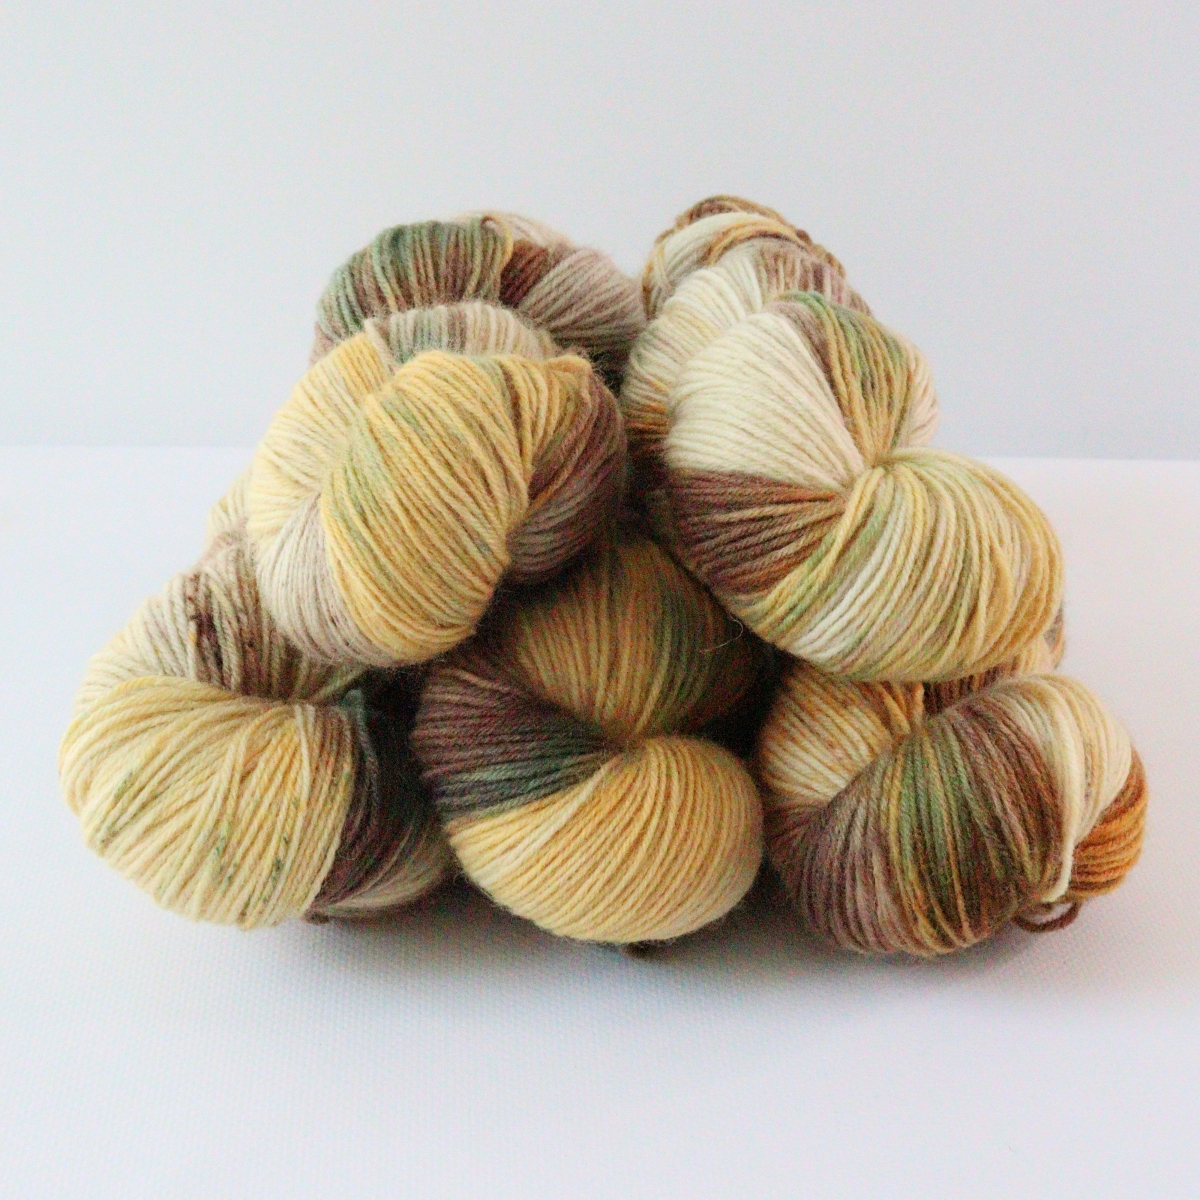 woodico.pro hand dyed yarn 088 1200x1200 - Hand dyed yarn / 088